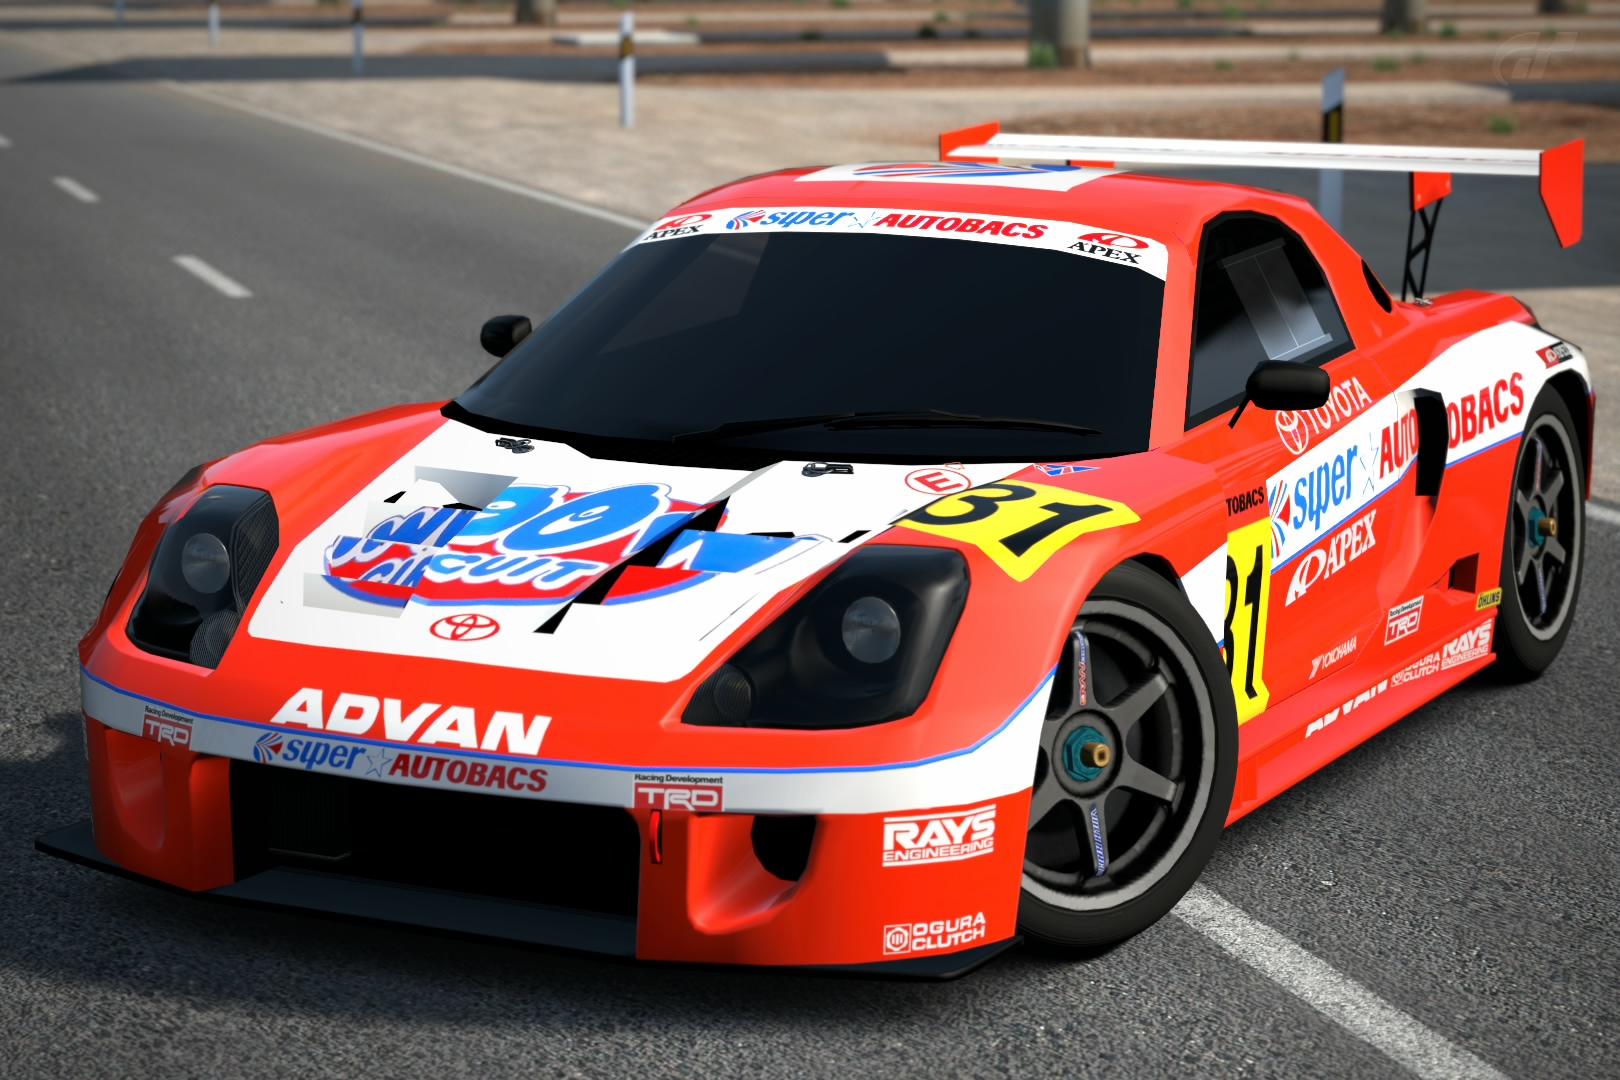 Toyota Superautobacs Apex Mr S Jgtc 00